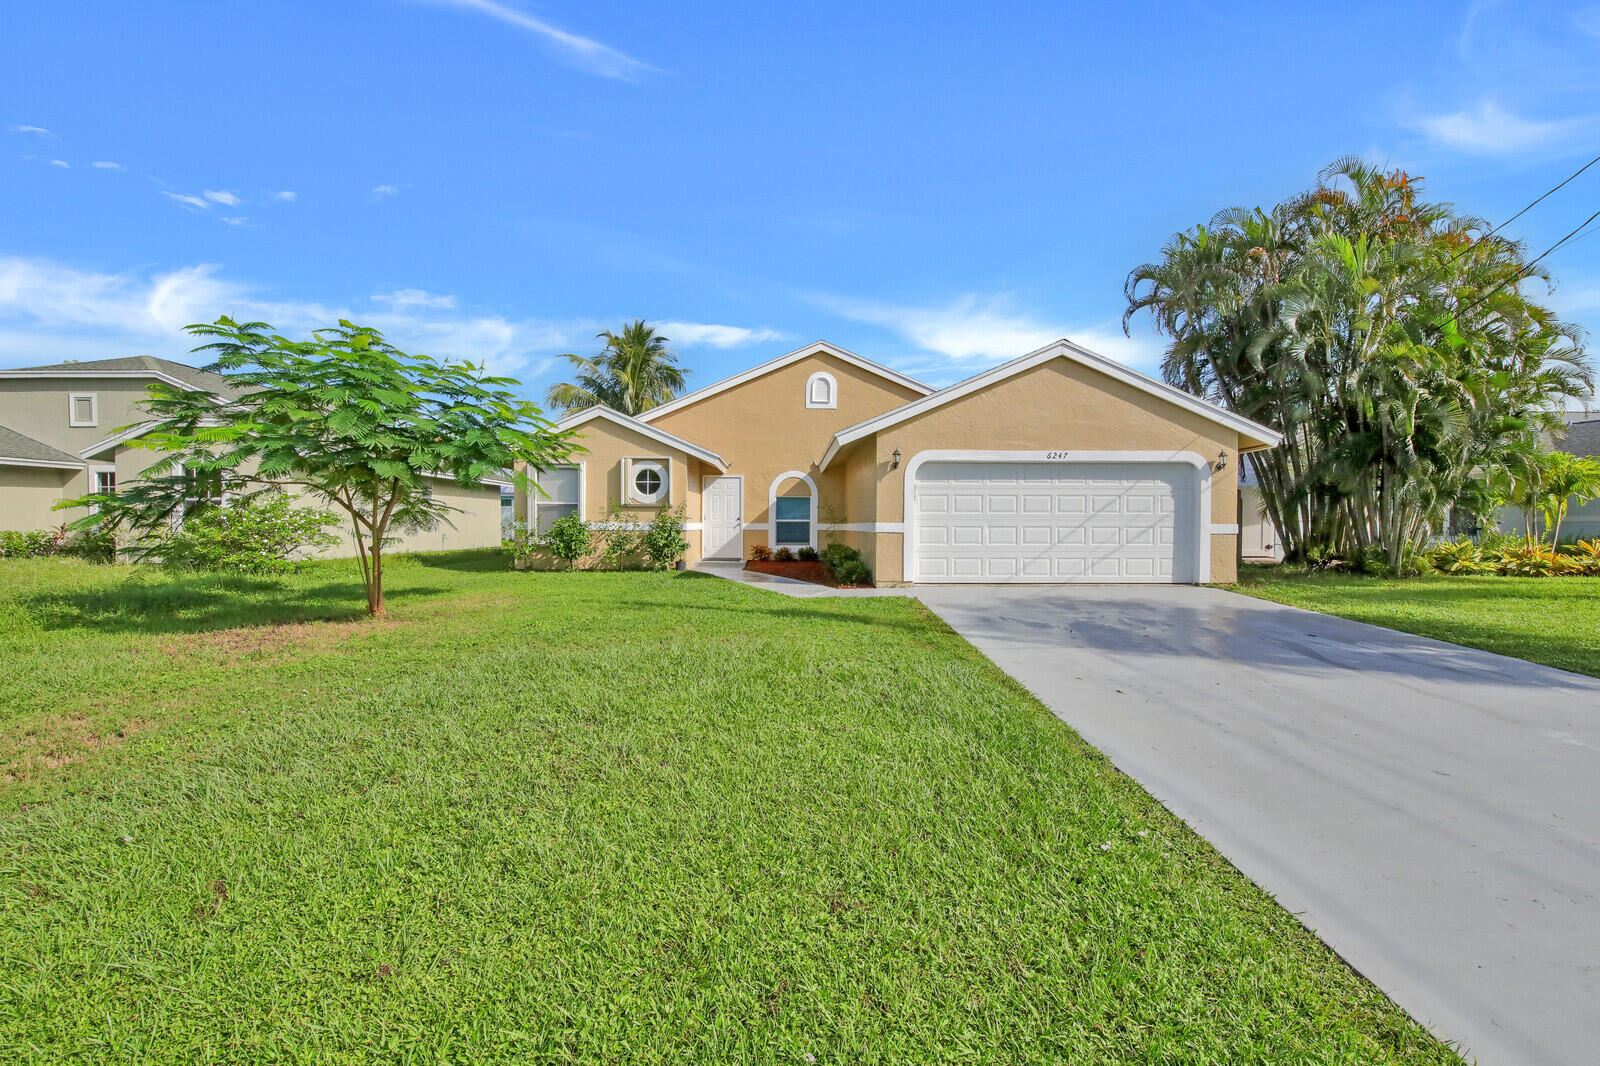 Photo for 6247 Robinson Street, Jupiter, FL 33458 (MLS # RX-10748619)